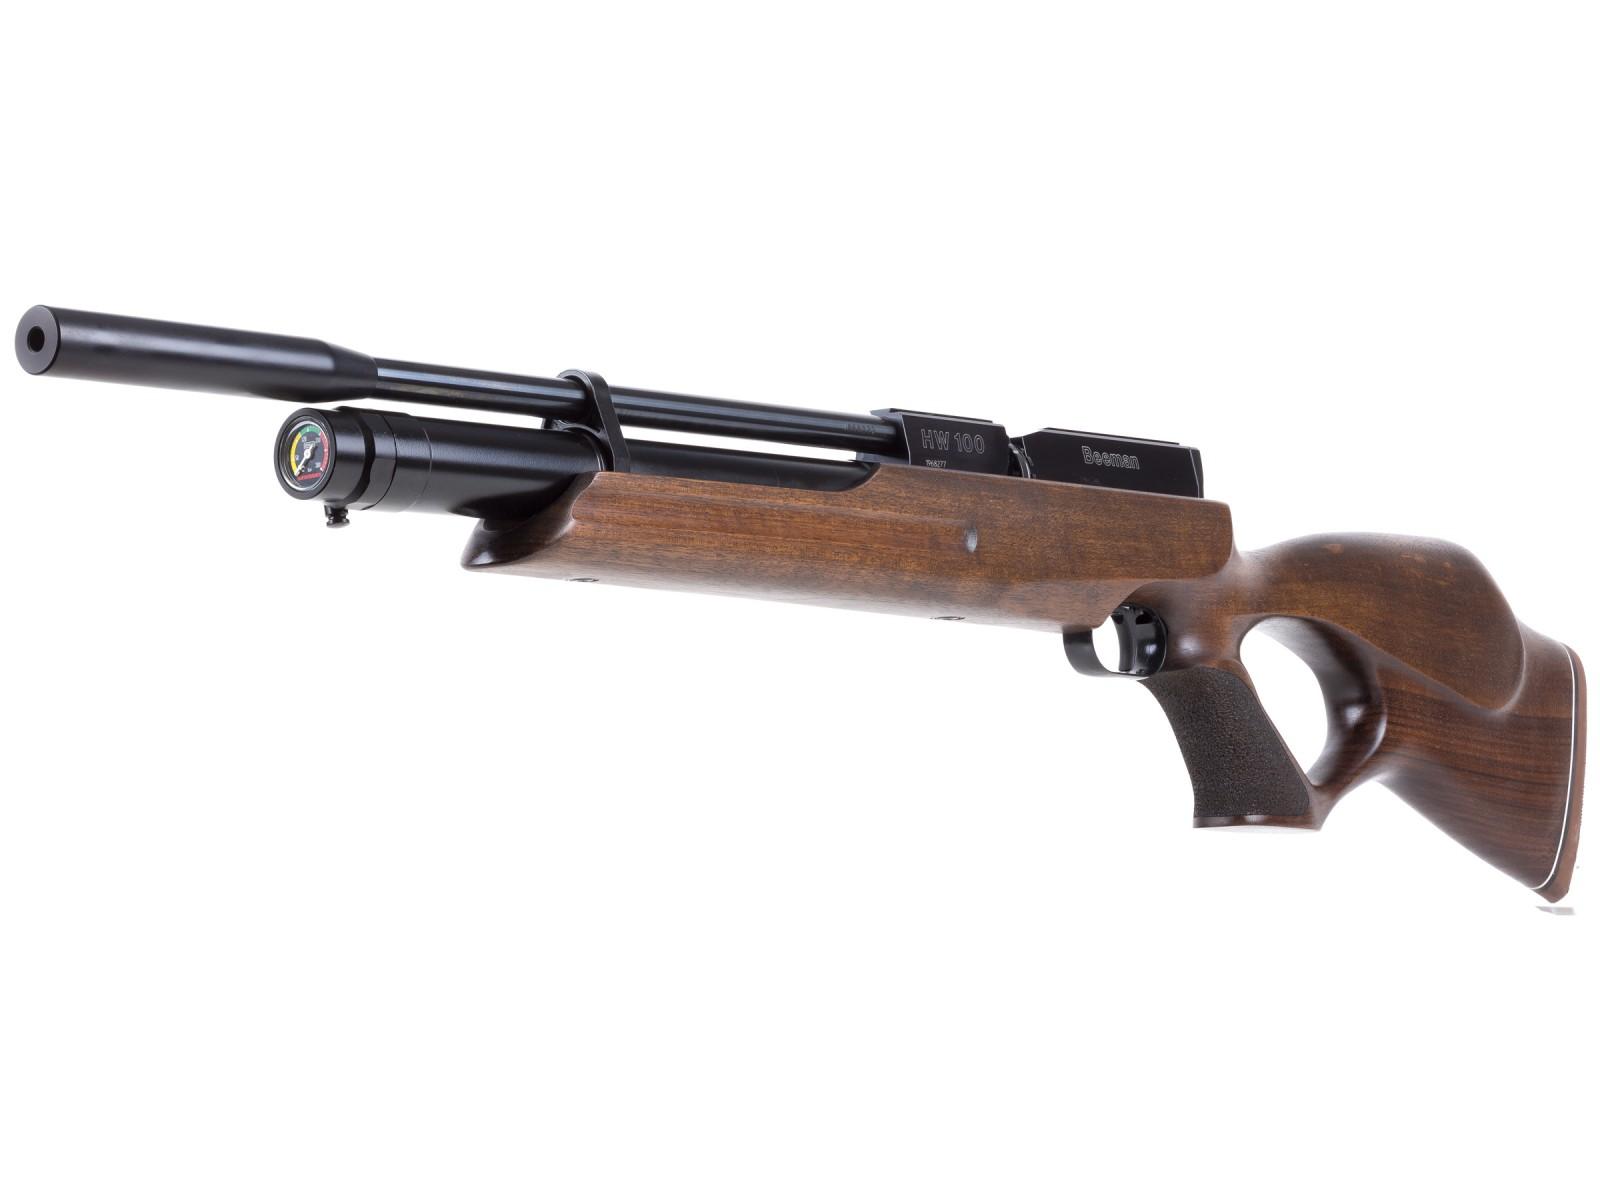 Cheap Beeman HW 100 TK PCP Air Rifle, Walnut Thumbhole 0.177